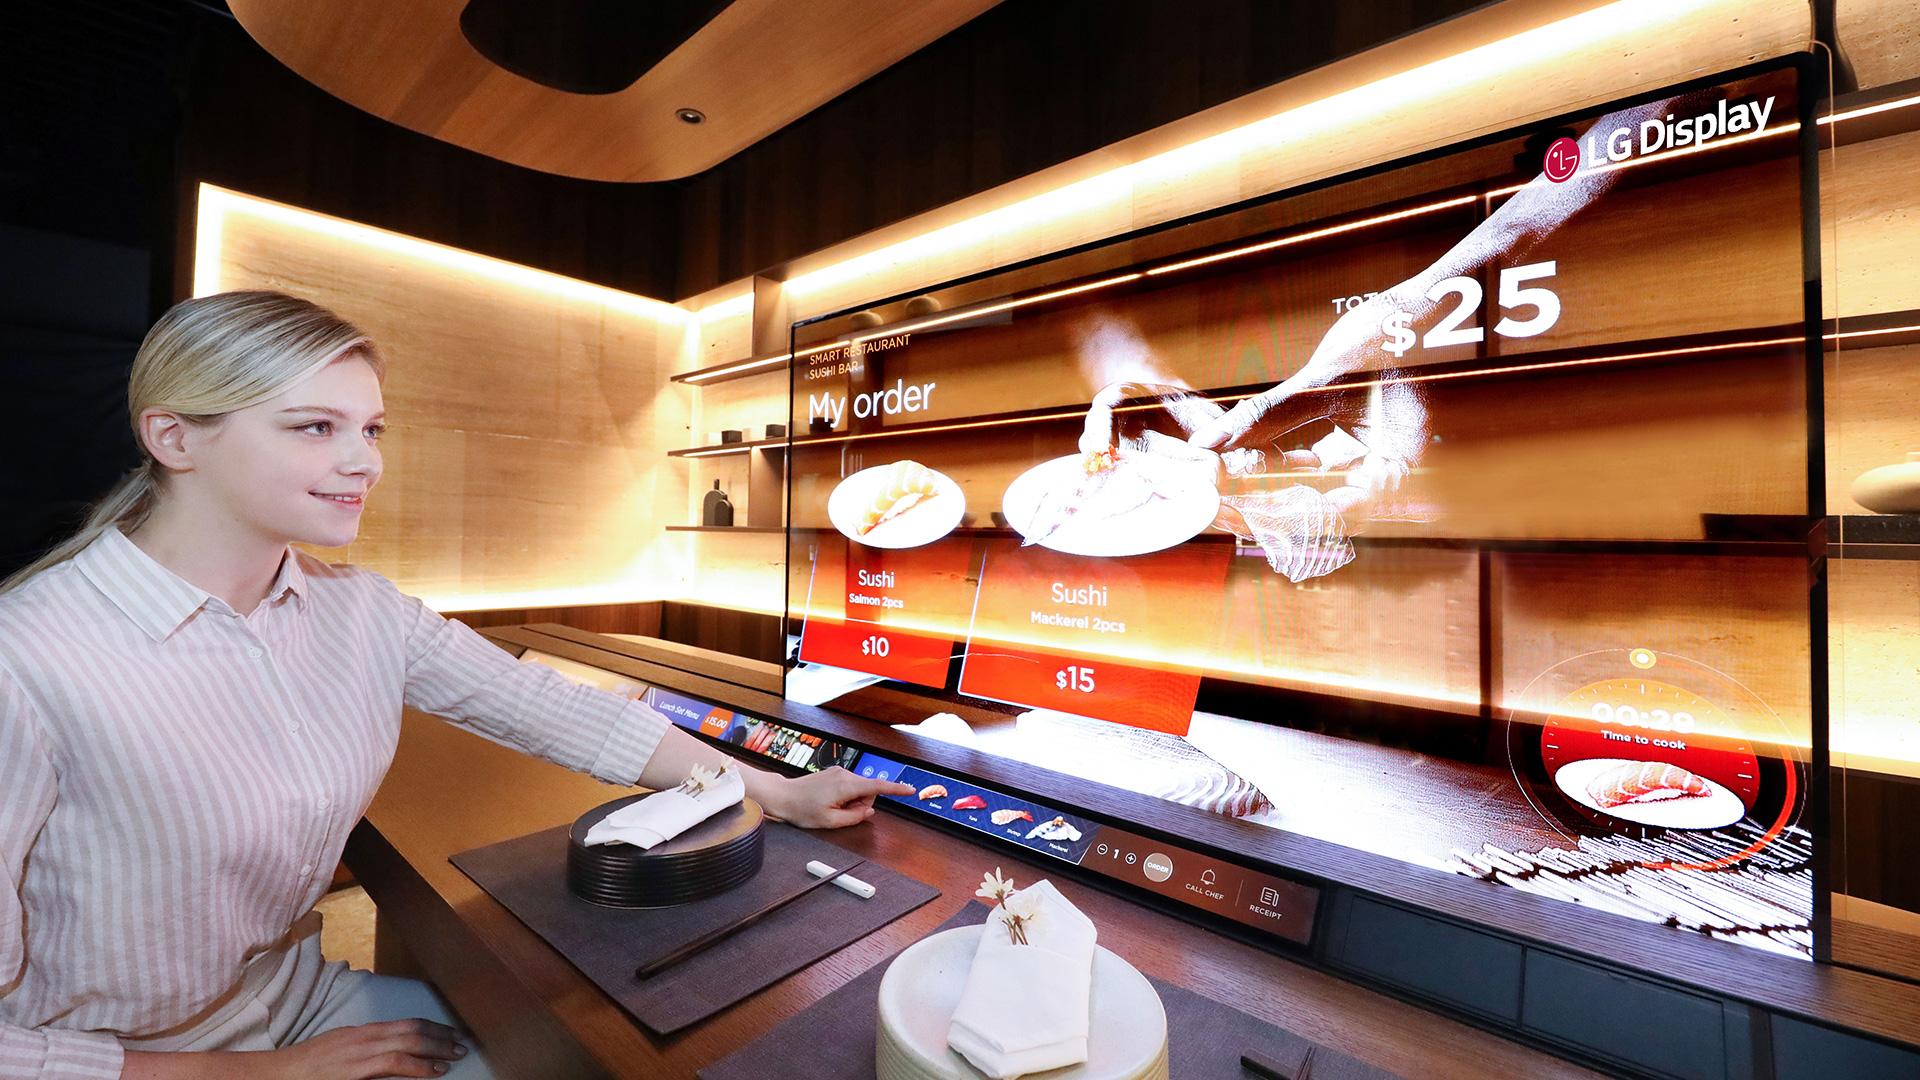 lg transparent oled display restaurant